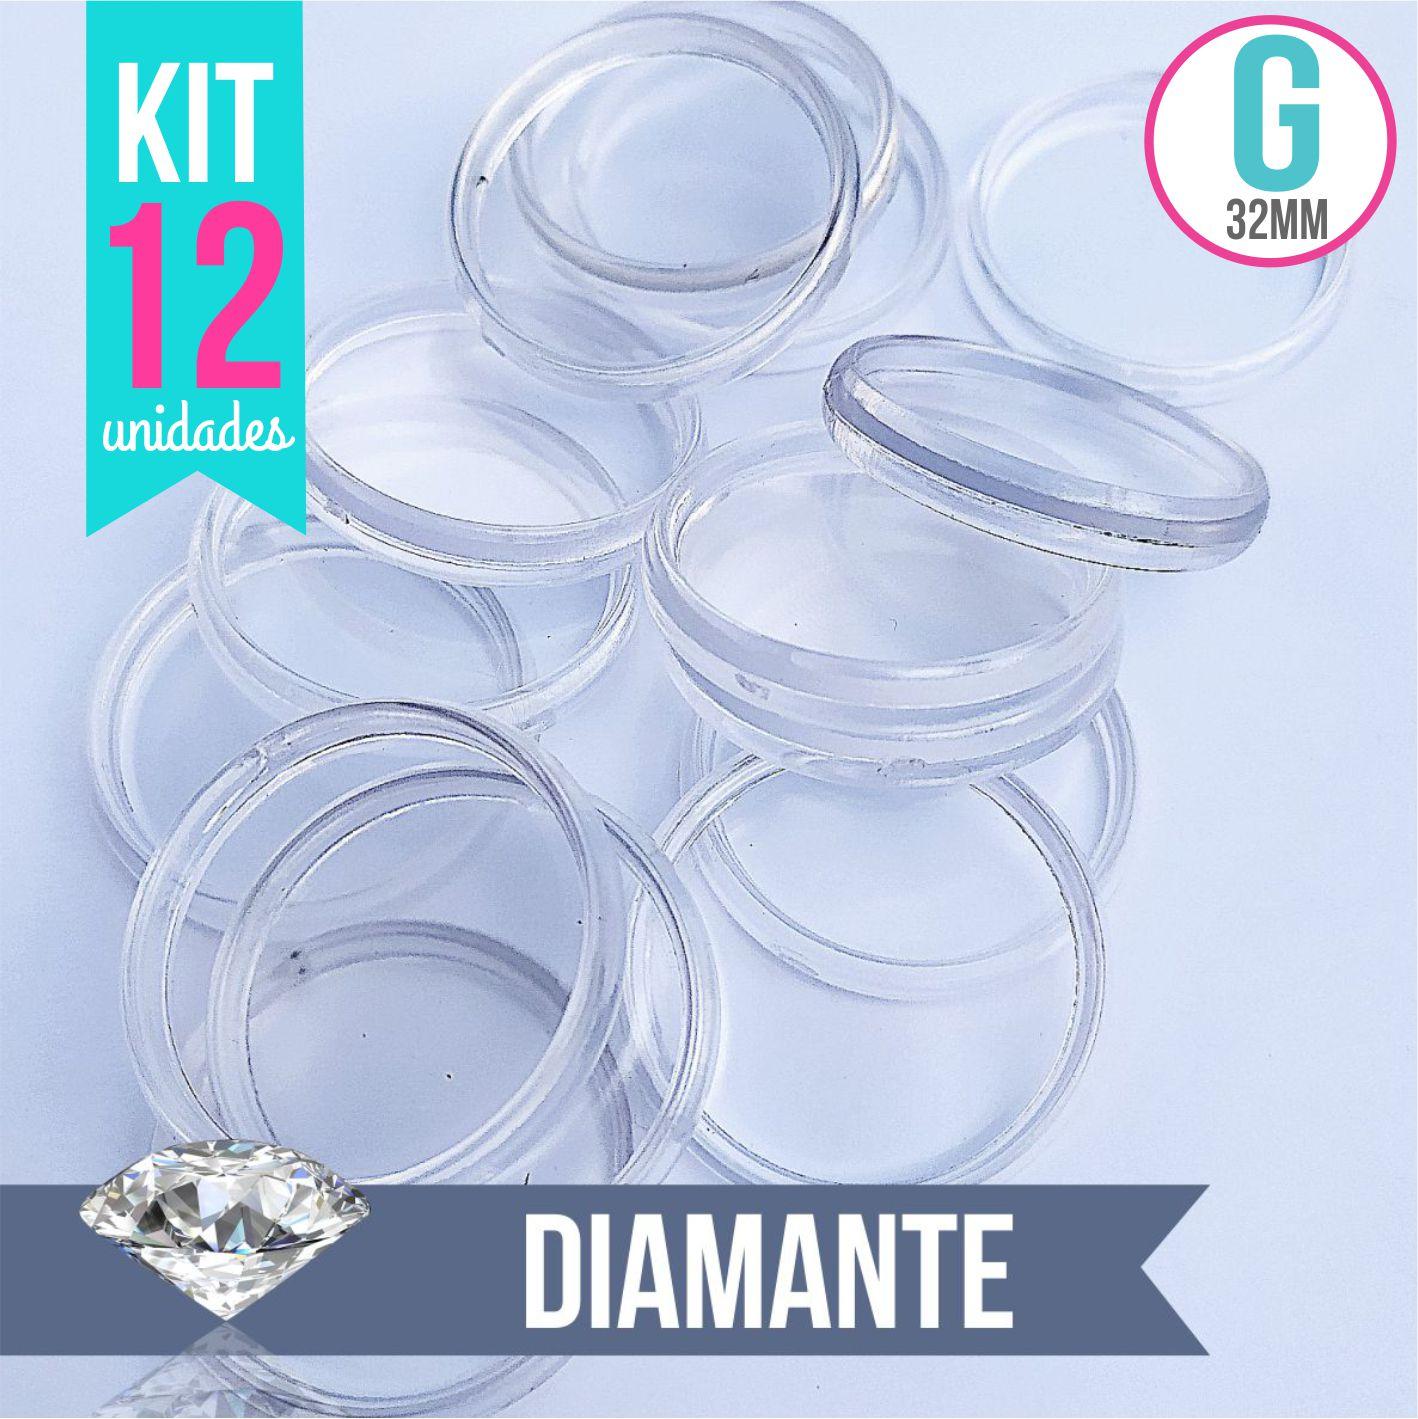 Kit 12 Discos G 32mm de Caderno Infinito Sistema Inteligente Translúcido Liso Amor Infinito - Diamante